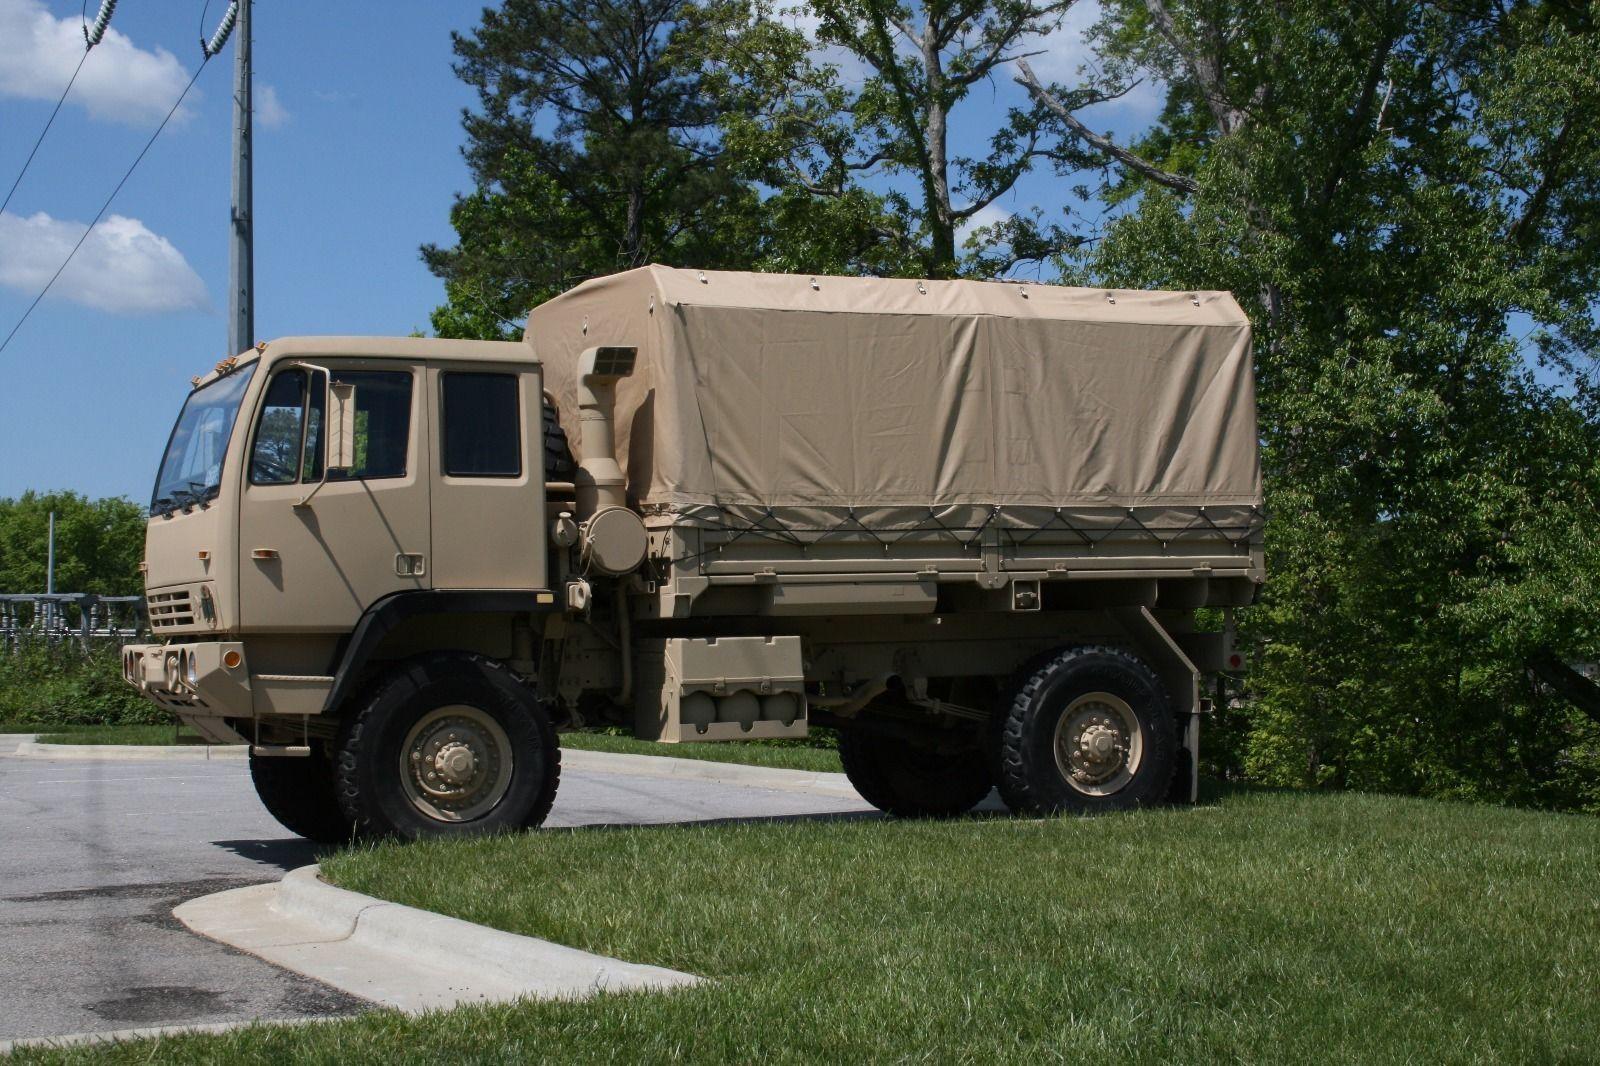 M1078 LMTV | eBay | Next Van | Pinterest | Vehicle, Expedition truck ...